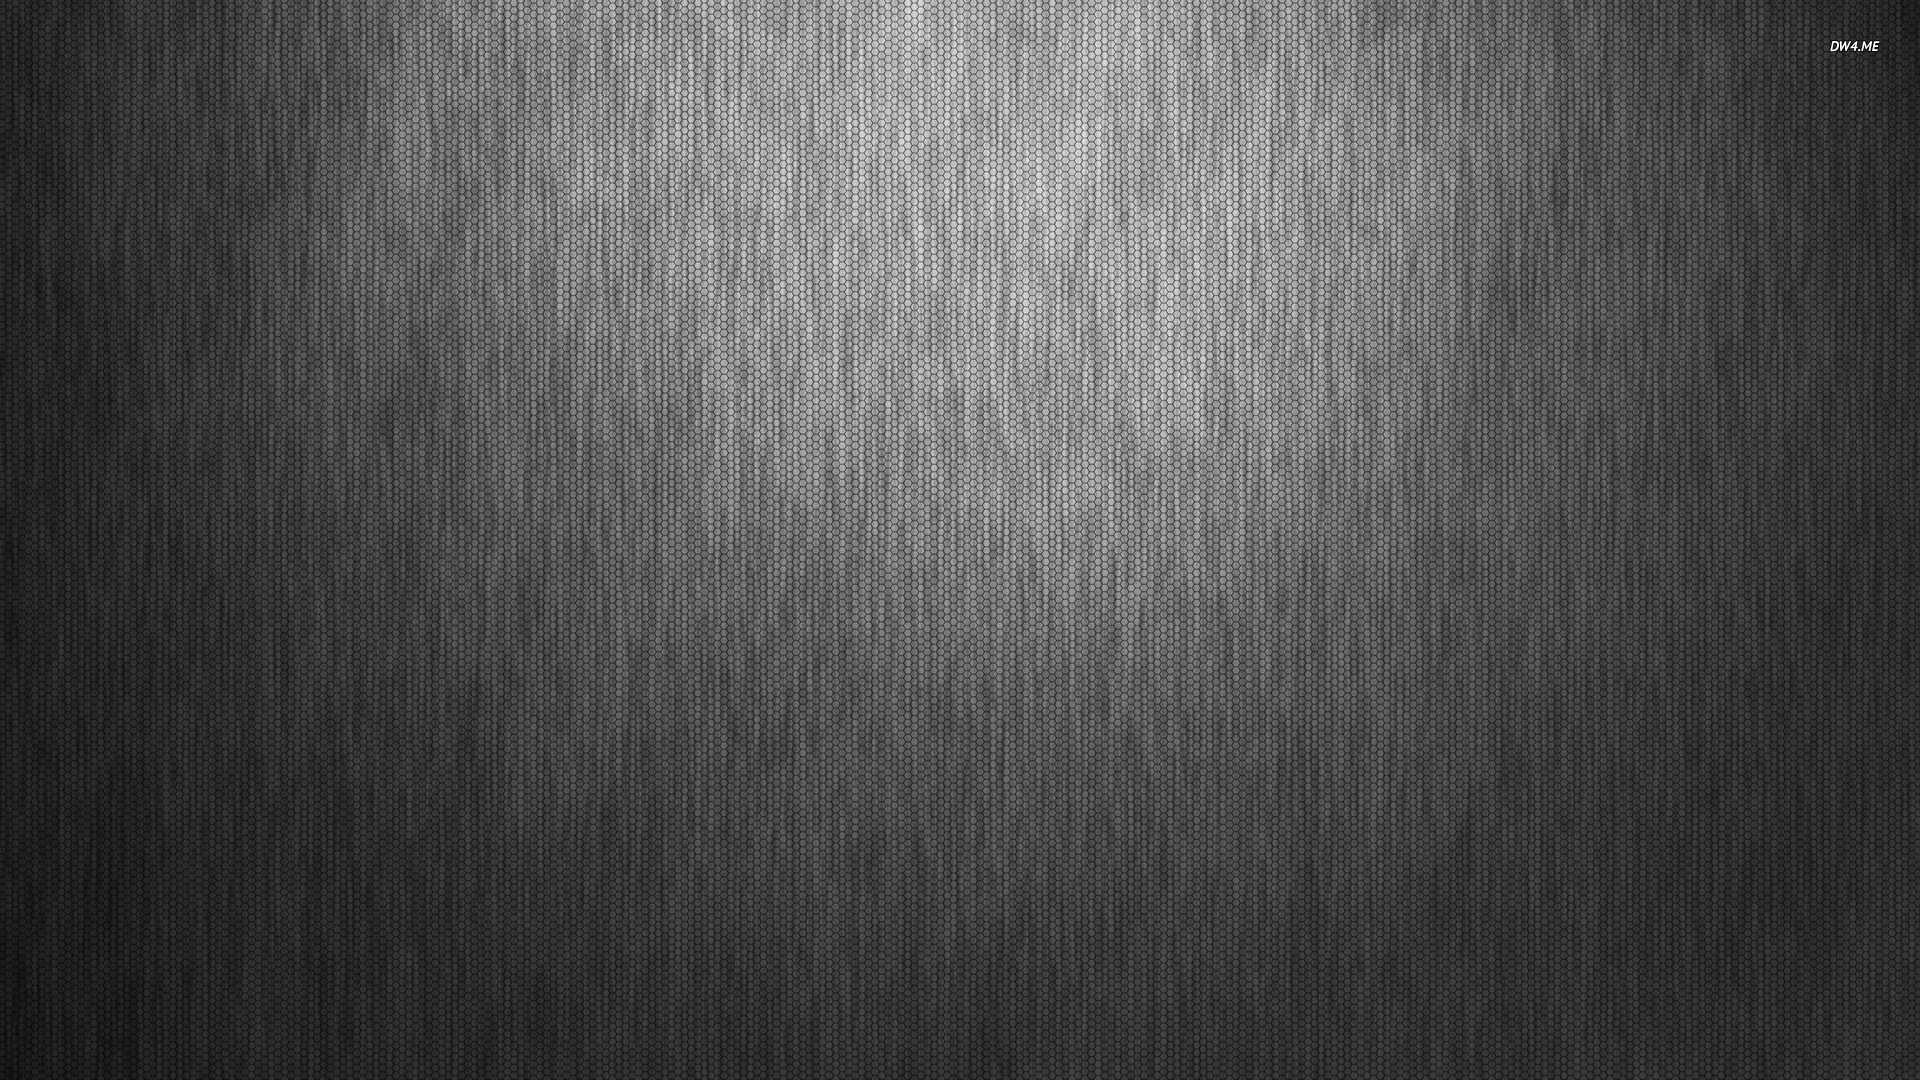 Metallic mesh wallpaper - Abstract wallpapers - #779